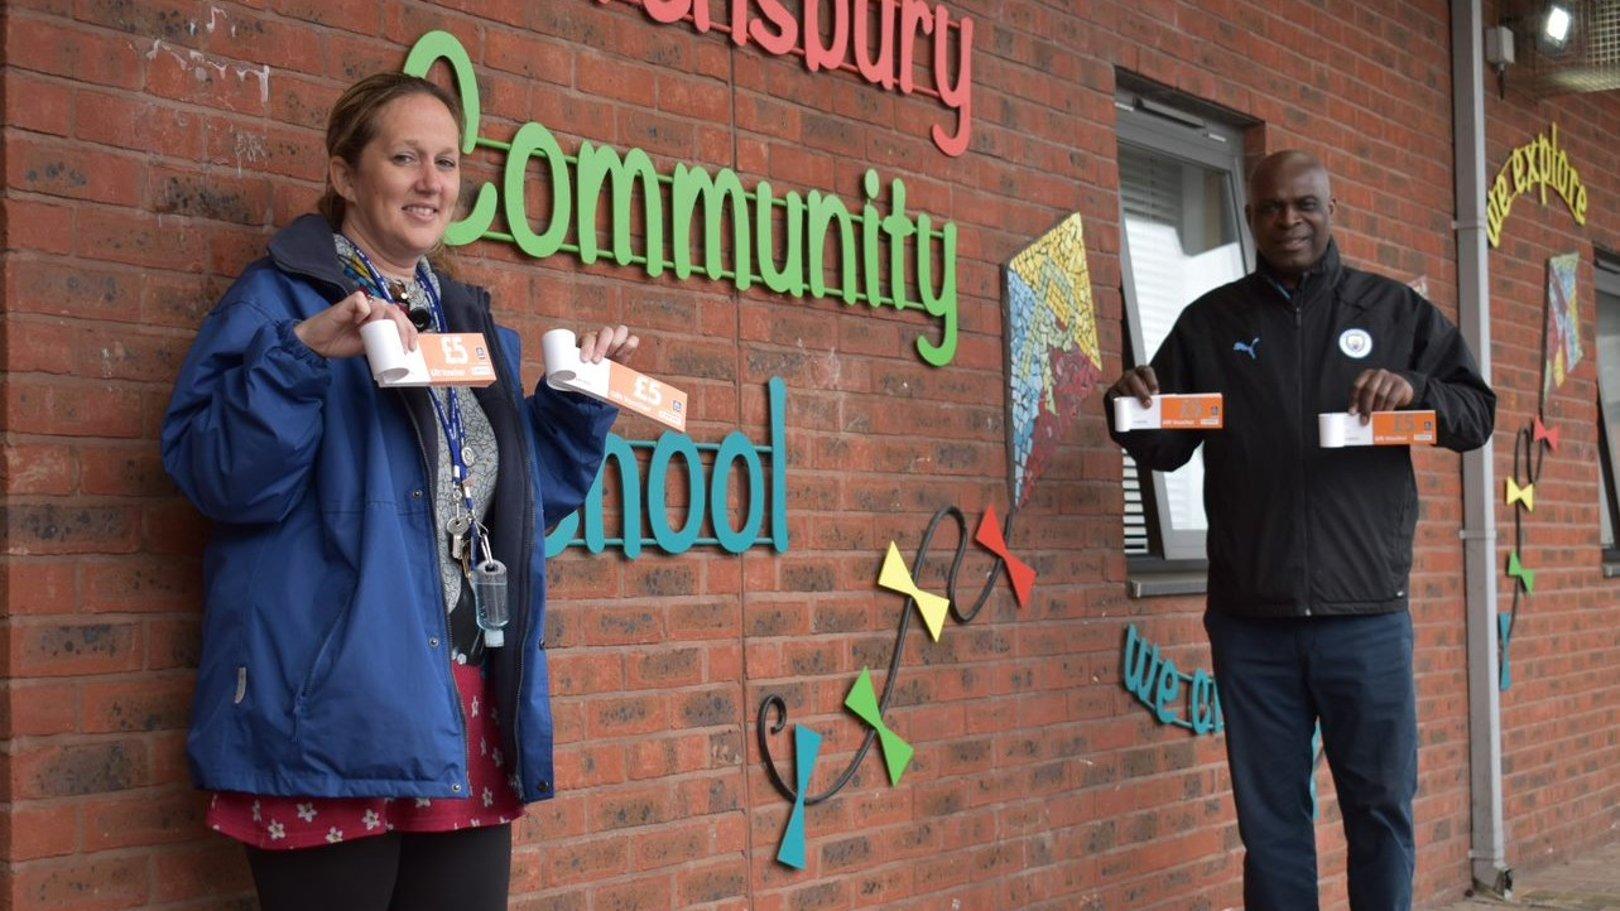 CITC deliver £10,000 worth of food vouchers to schools